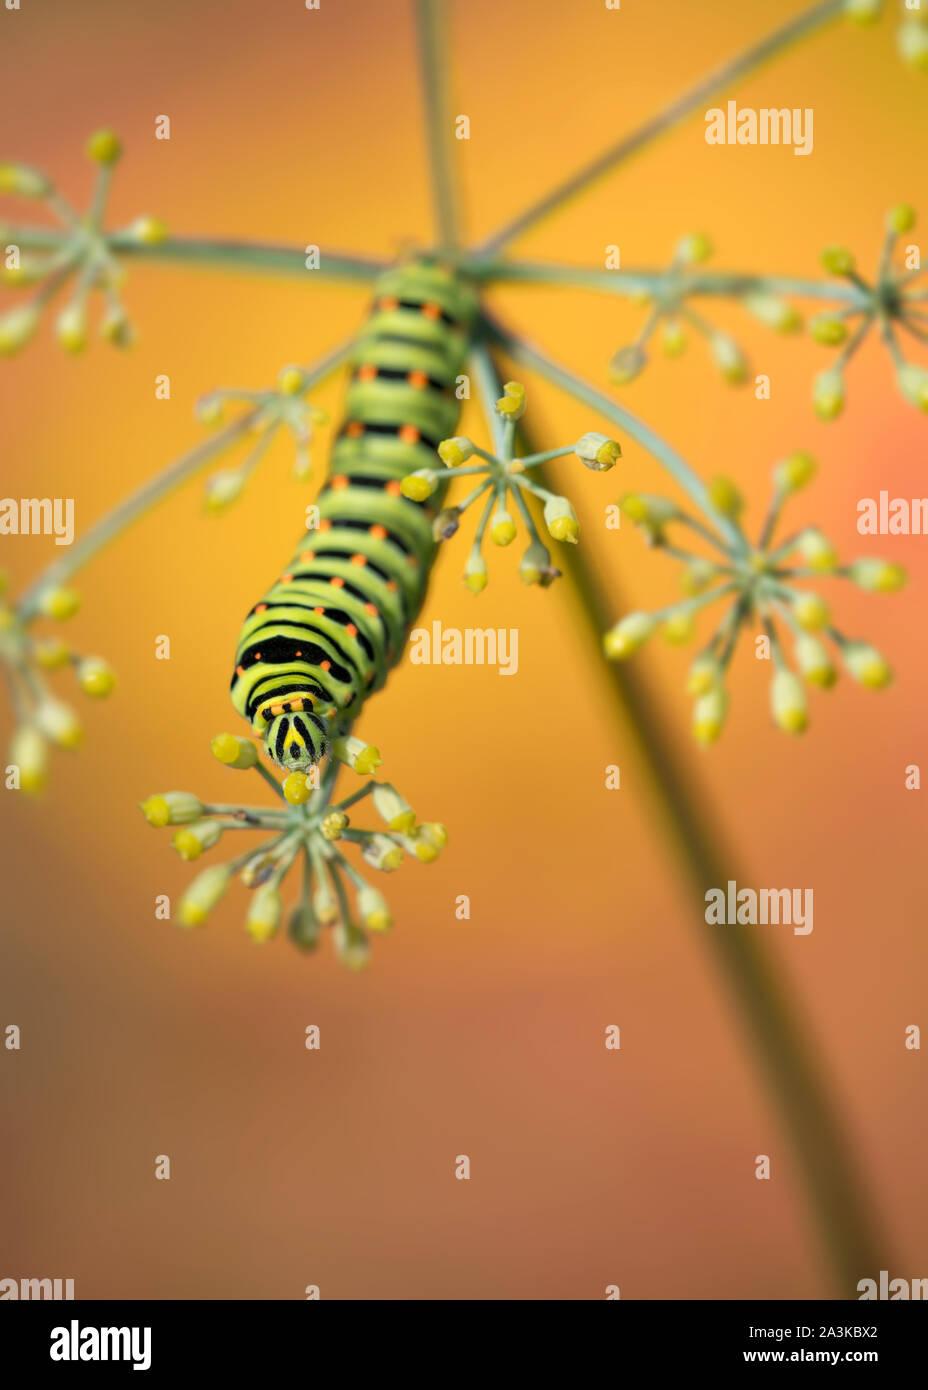 The king's garden, portrait of Swallowtail caterpillar (Papilio machaon) Stock Photo